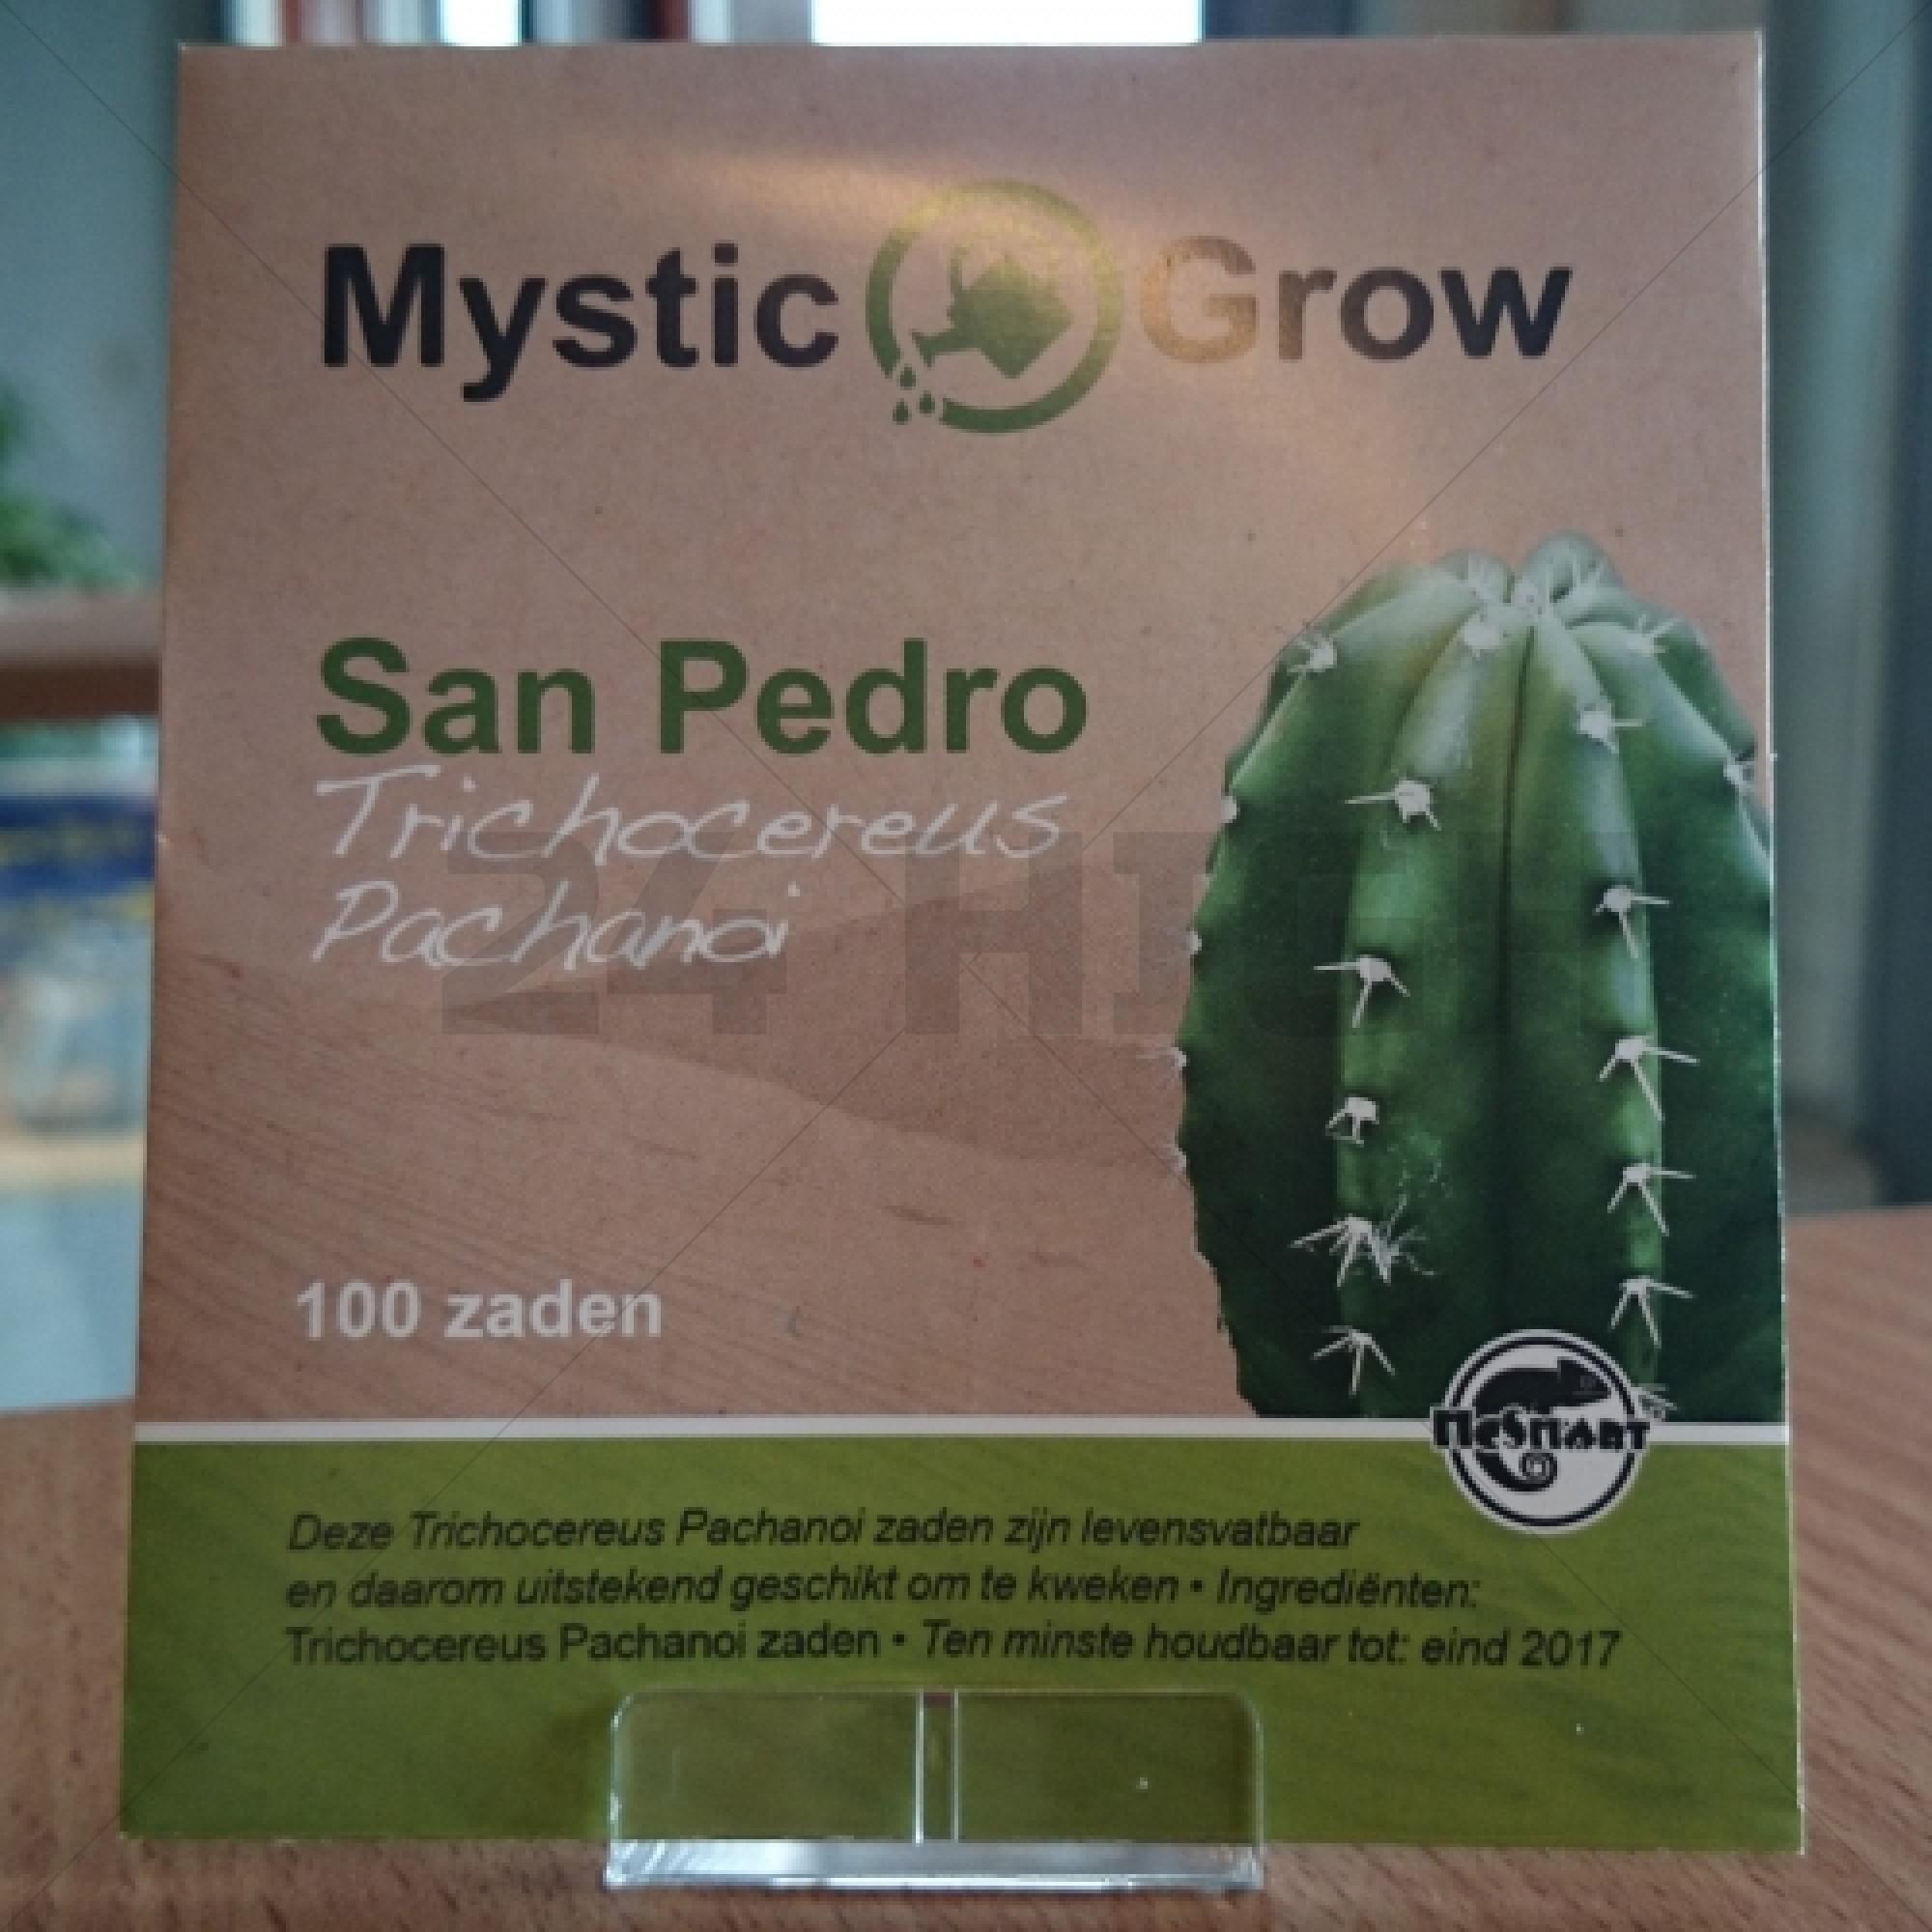 San Pedro semillas (Trichocereus Pachanoi)